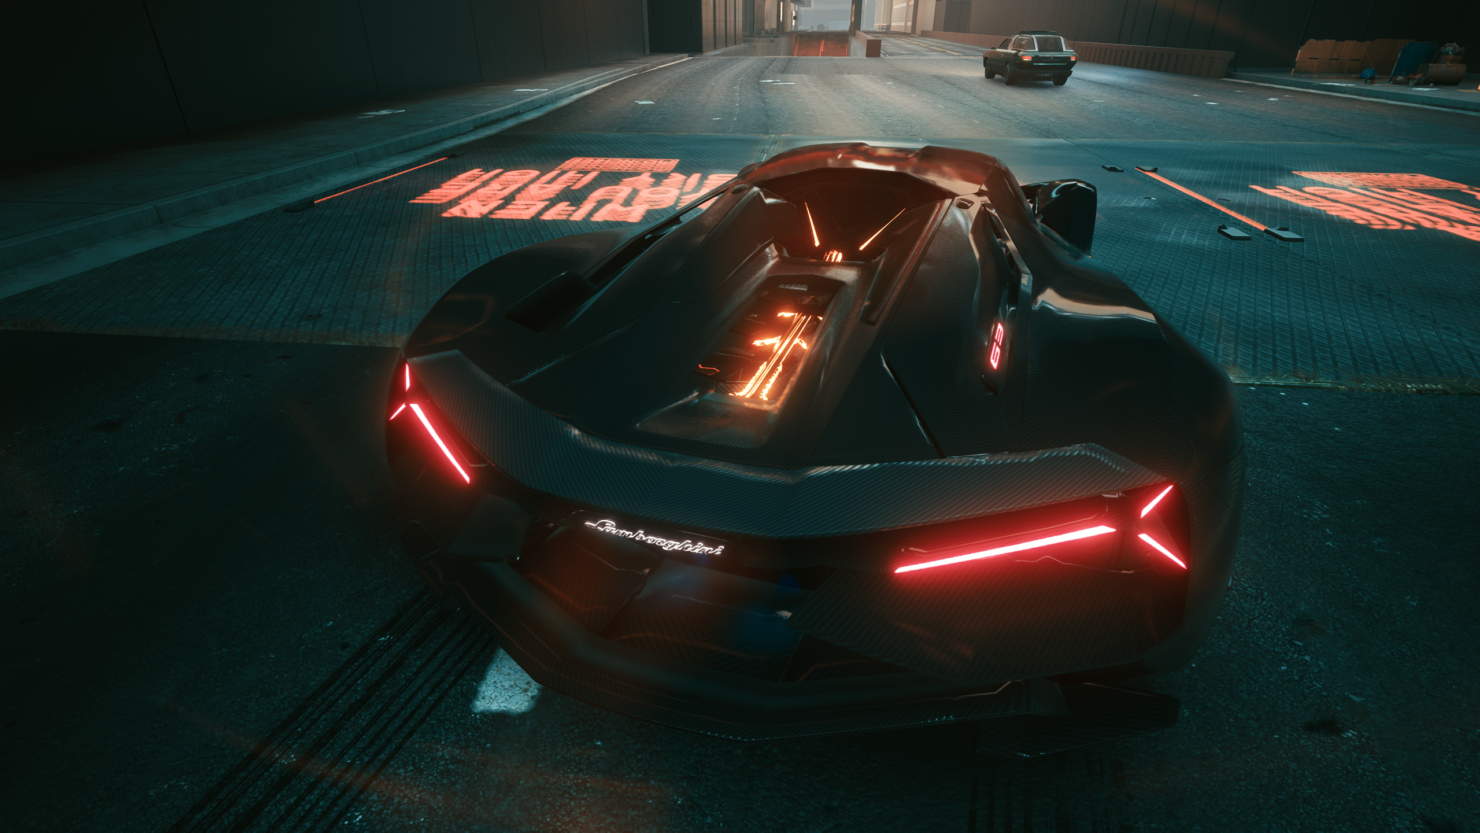 cyberpunk-vehicle-mod-lamborghini-terzo-millennio-electric-hypercar-7